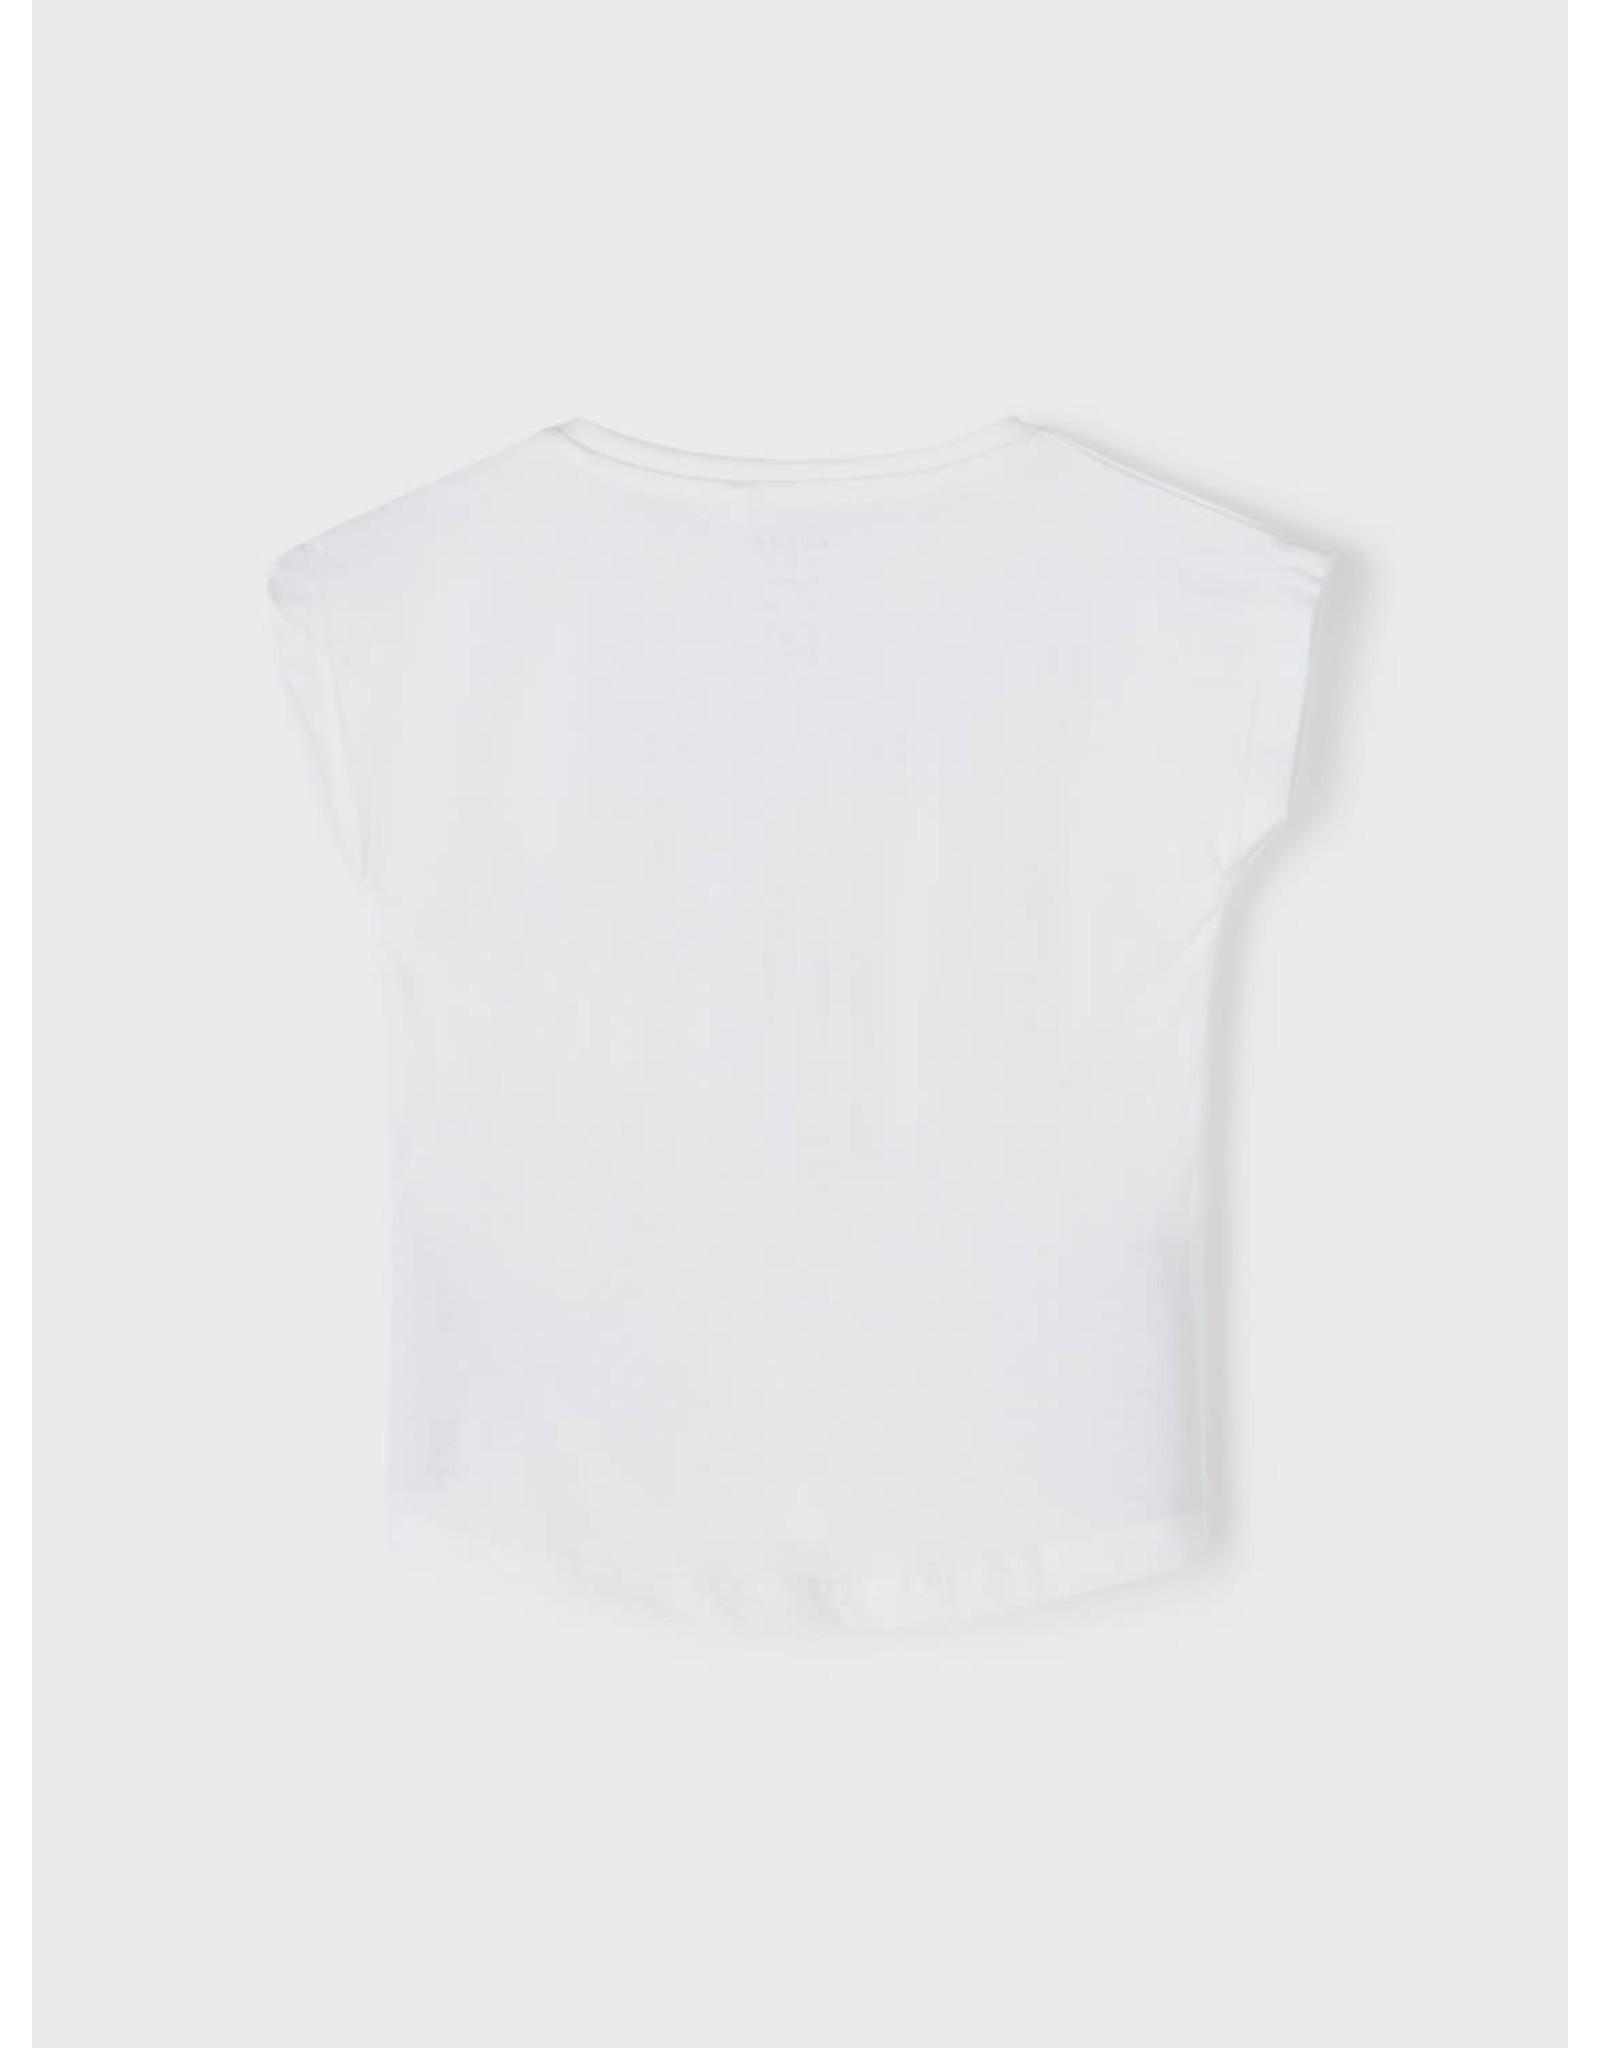 Name It Basis witte bedrukte t-shirt voor kleine meisjes